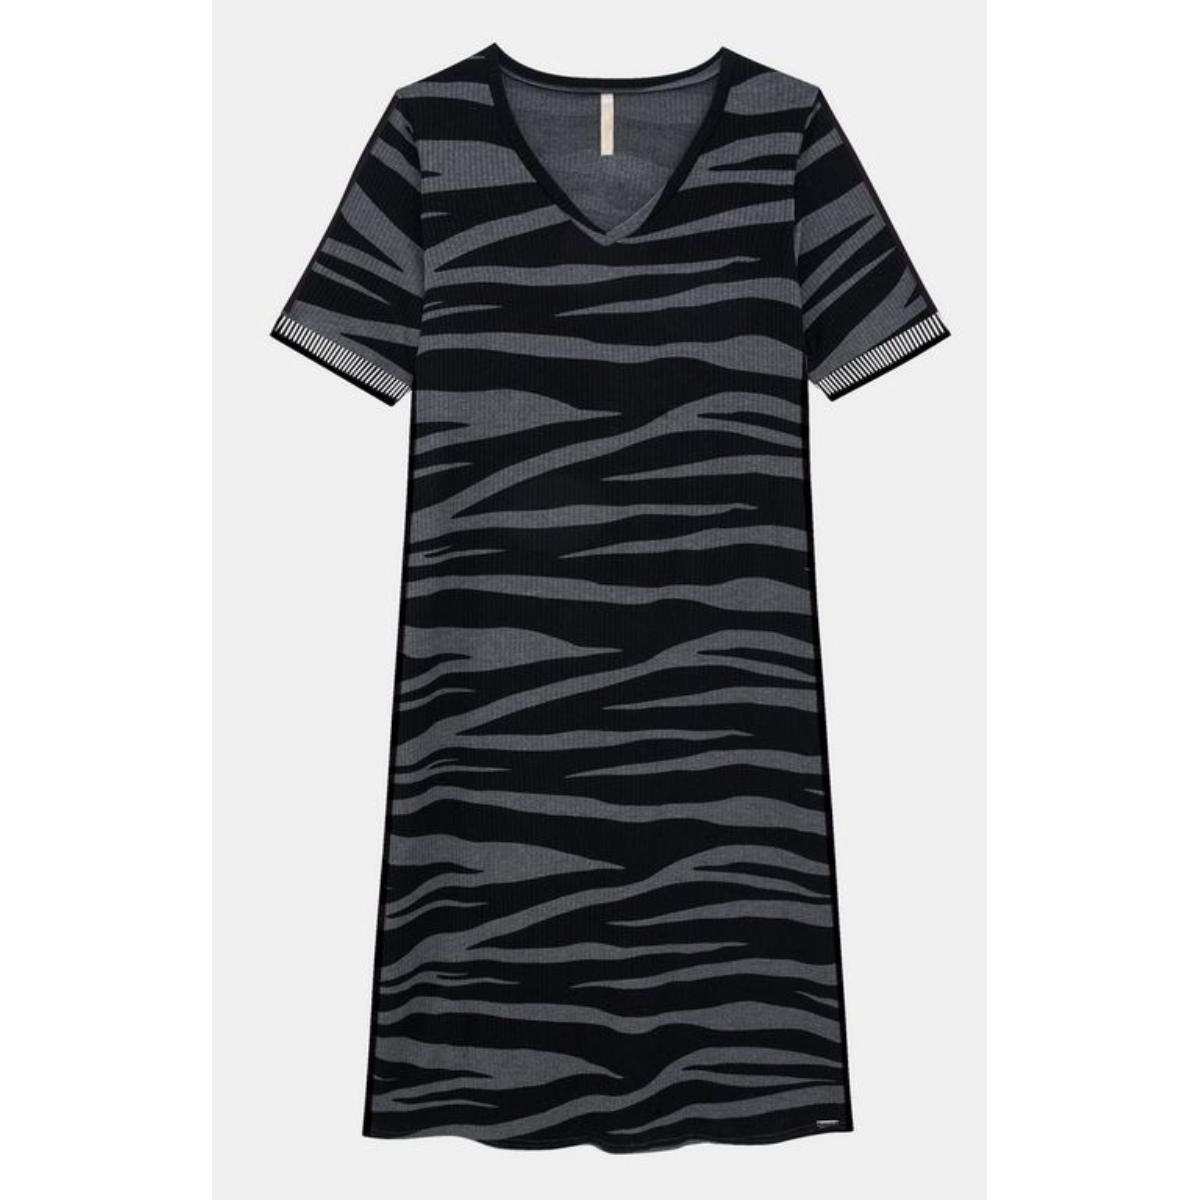 Vestido Feminino Lunender 60185 Mescla